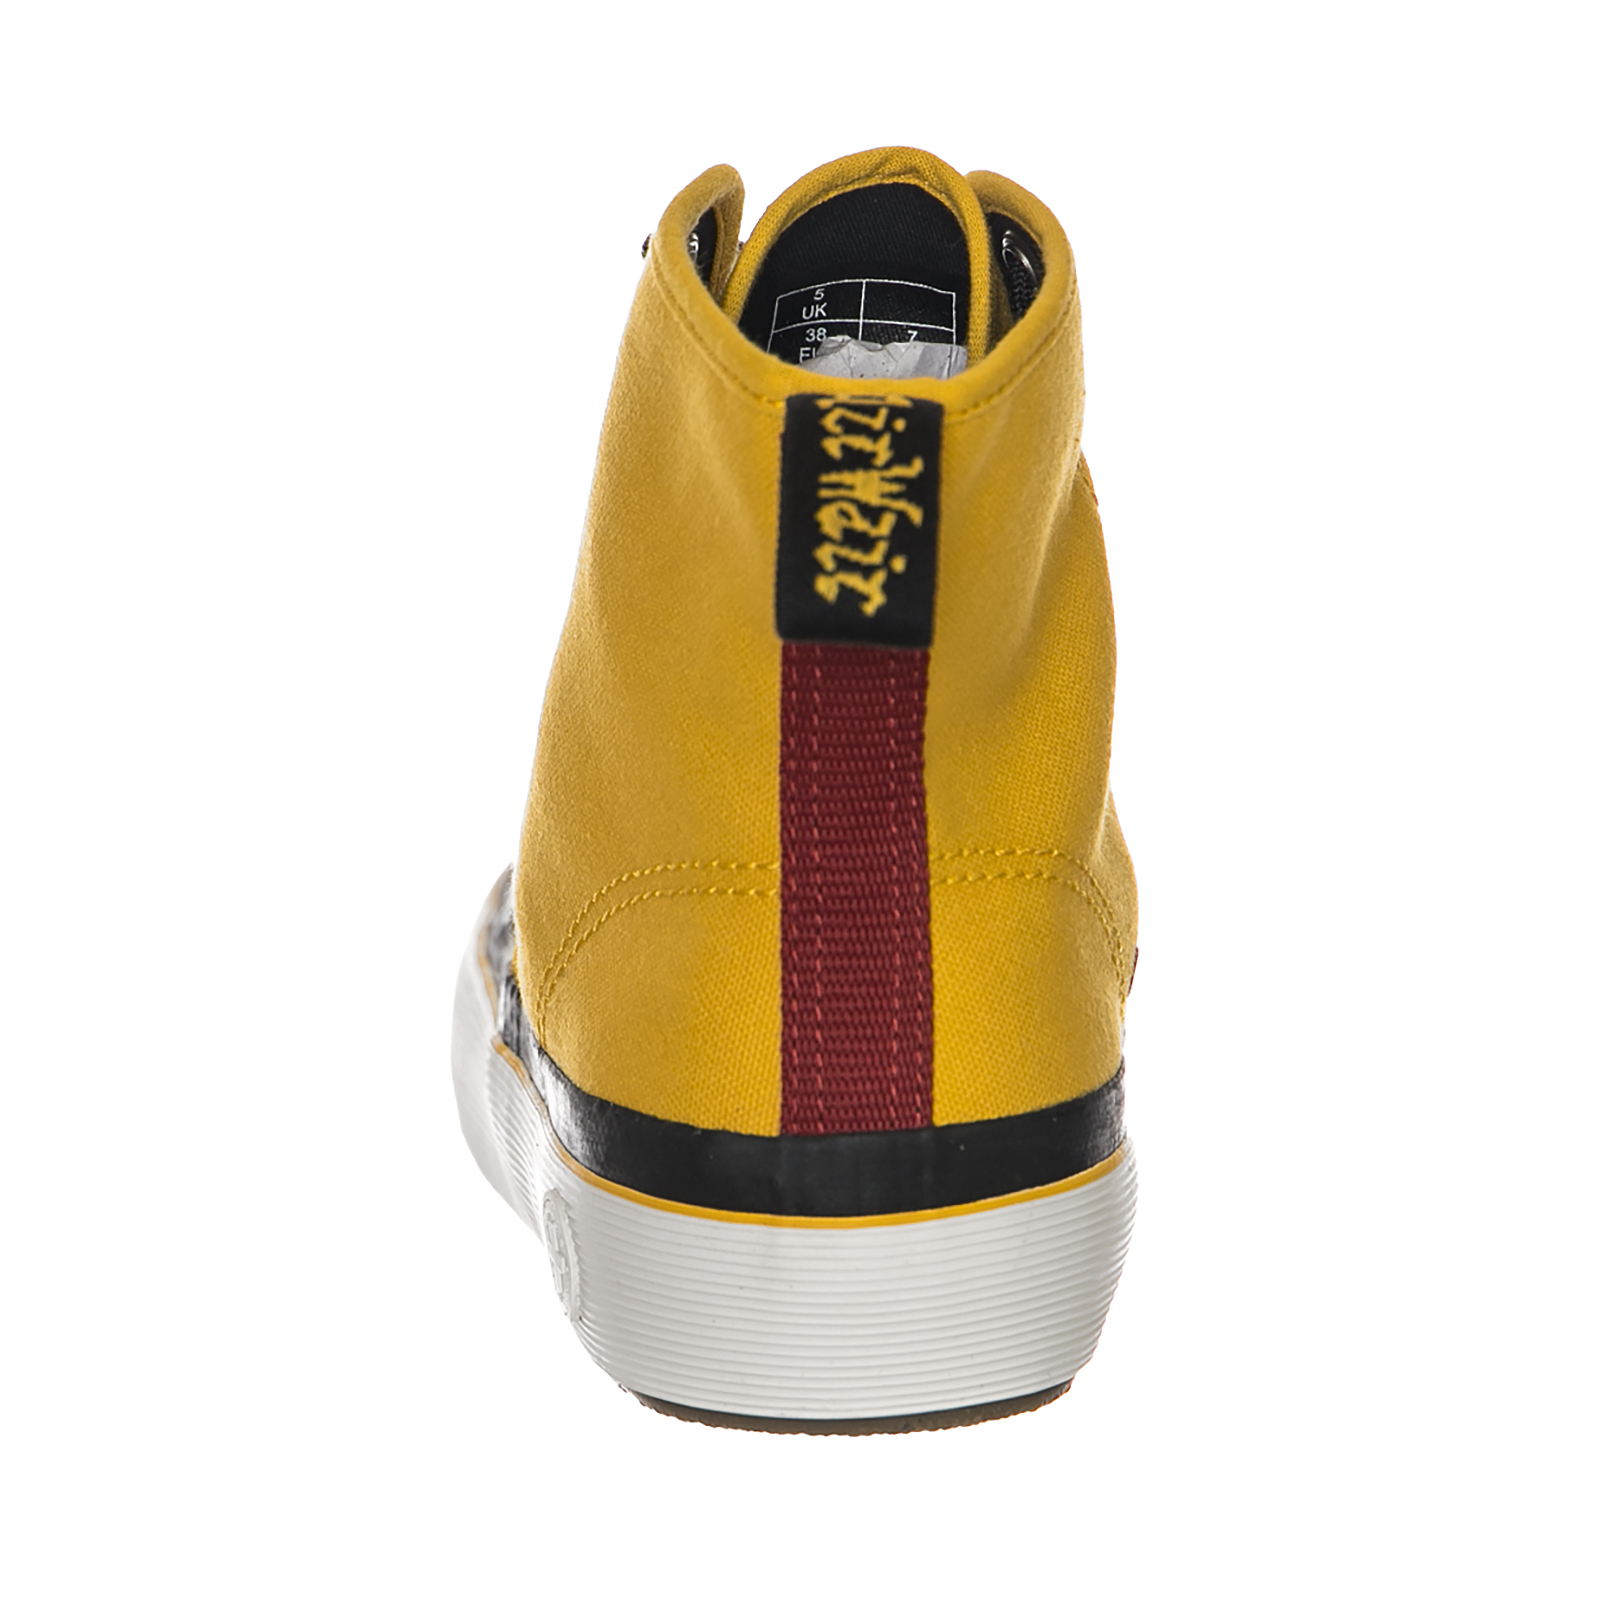 check out 3da91 66423 Dr.Martens Zapatillas Monet Dms Amarillo Dark Rojo Lona amarillo b1a9d8 -  higrotemper.es